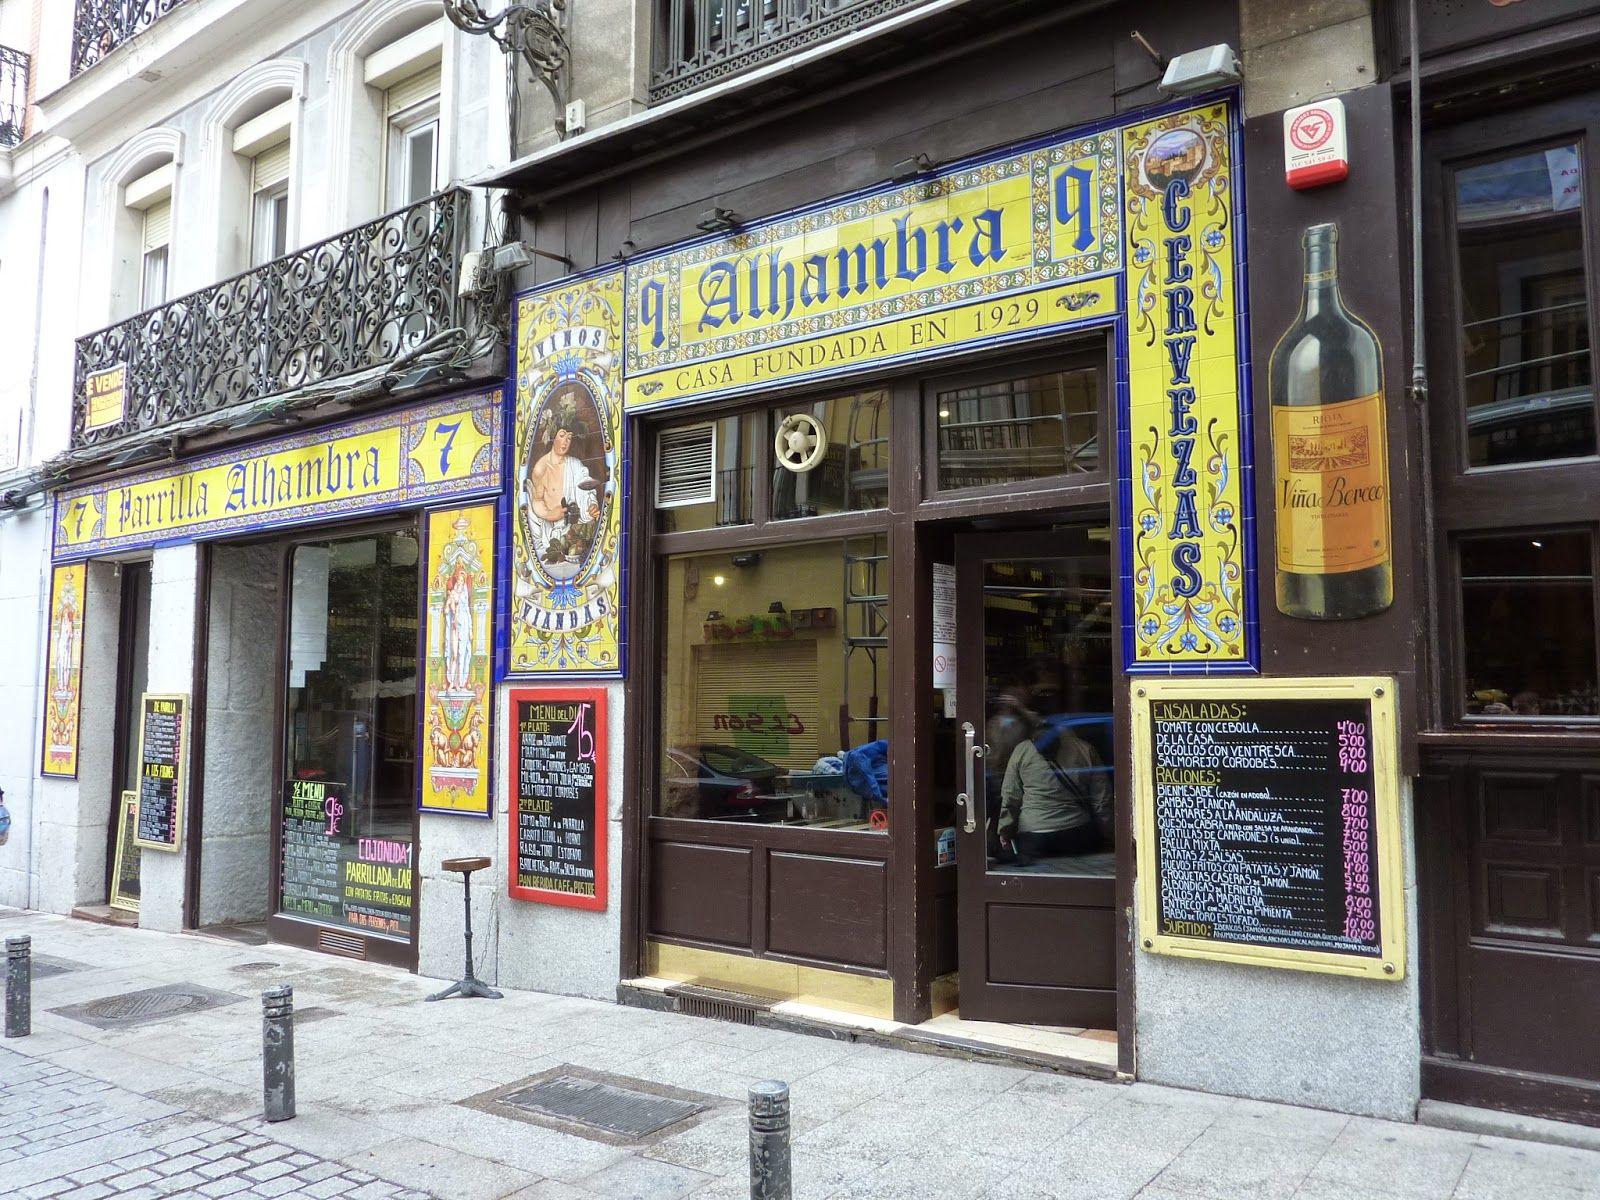 Taberna Alhambra Fachadas De Restaurantes Fachadas De Tiendas Tiendas Antiguas